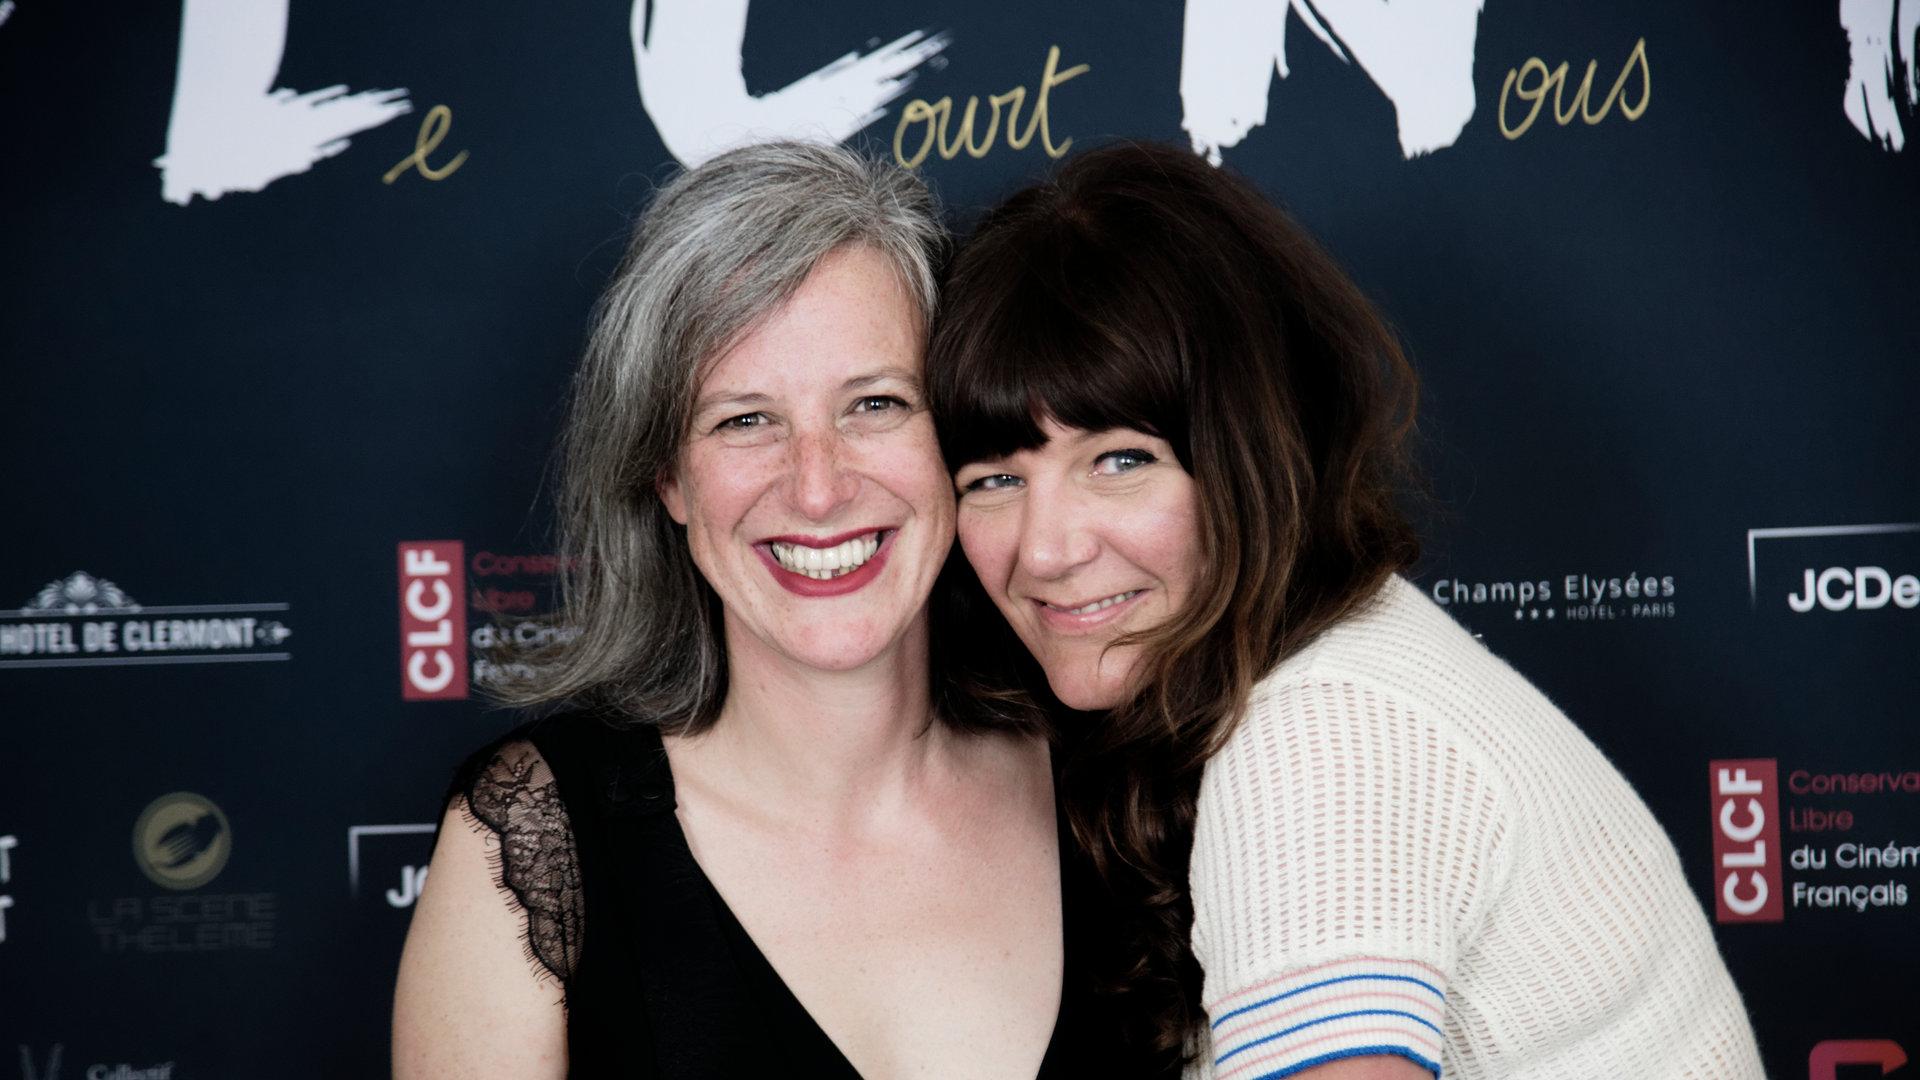 Ingrid Heiderscheidt et Julie Carrière